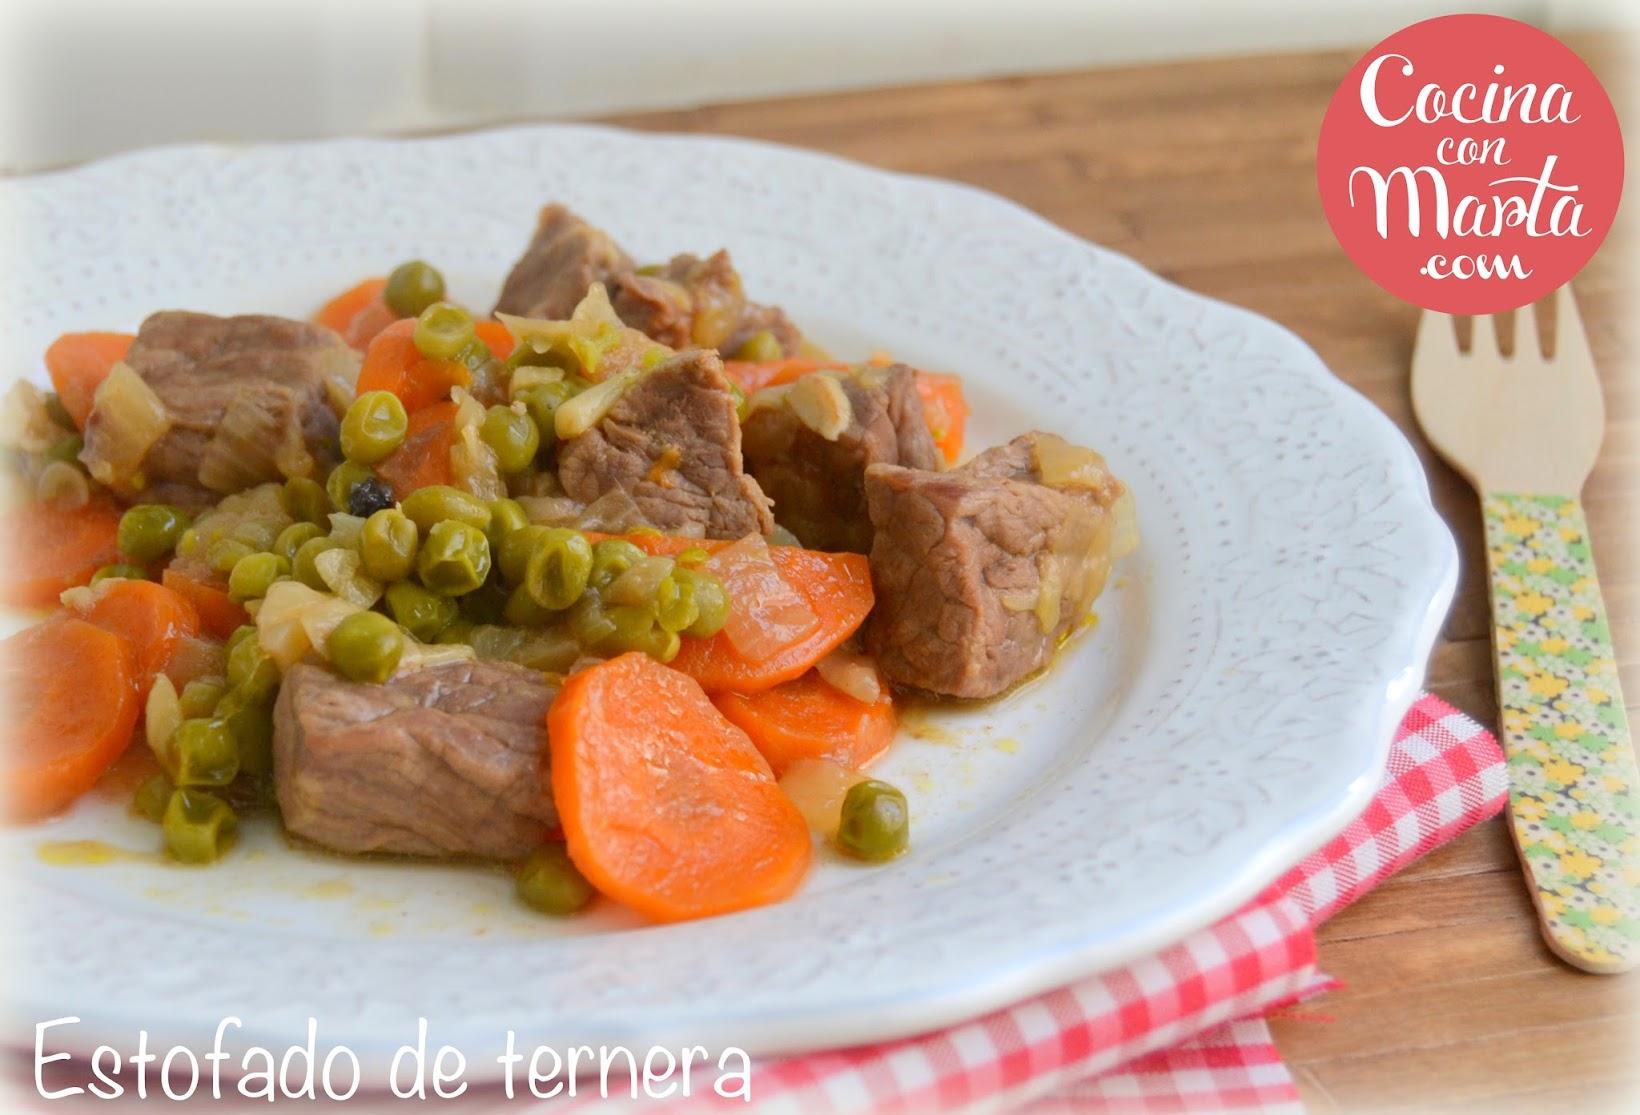 Estofado de ternera, receta casera, zanahorias, guisantes, verduras, vino, Olla GM, Cocina con Marta, fácil, rápida, casero